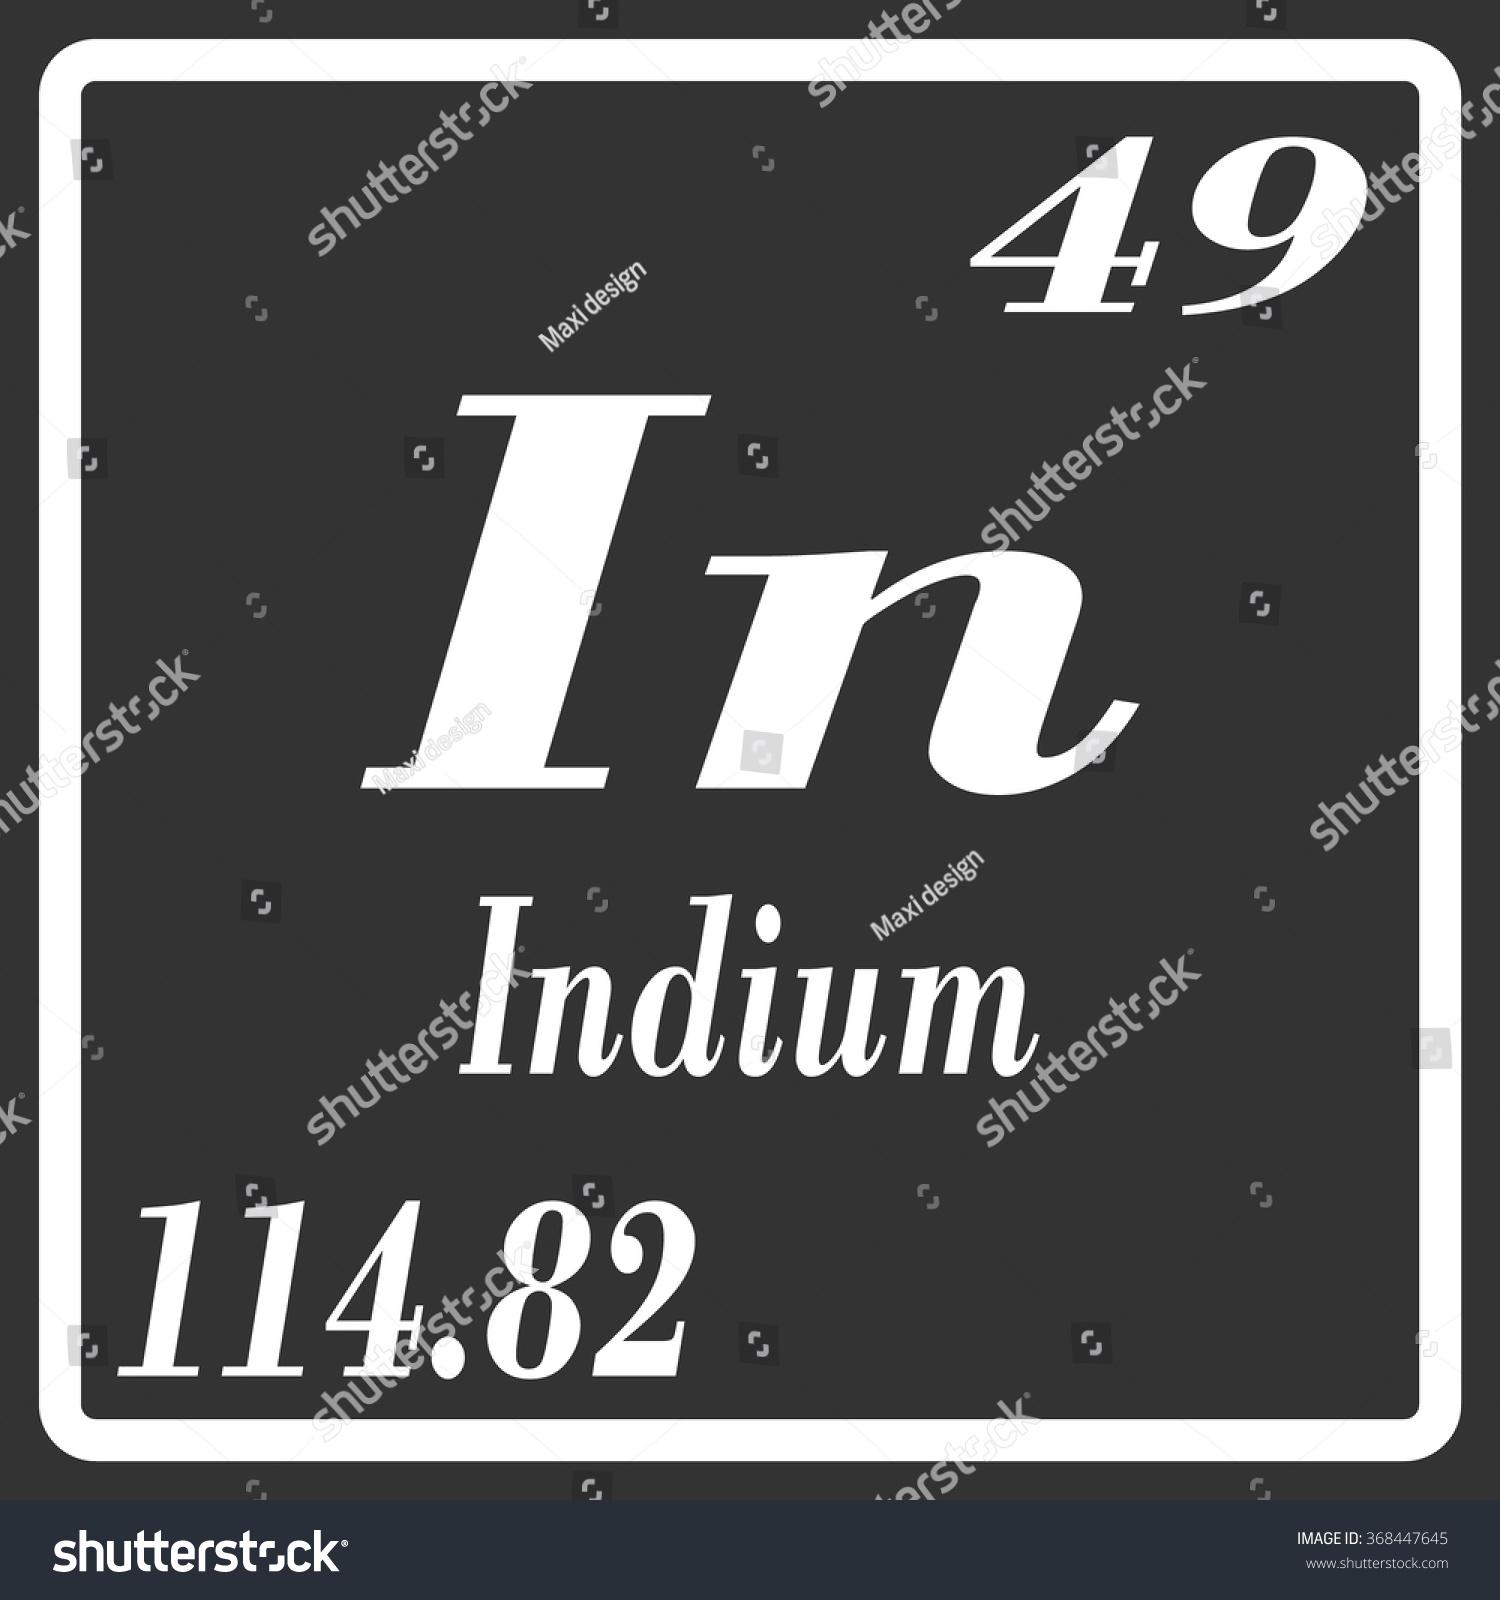 Indium periodic table gallery periodic table images periodic table elements indium stock vector 368447645 shutterstock periodic table of elements indium gamestrikefo gallery gamestrikefo Images